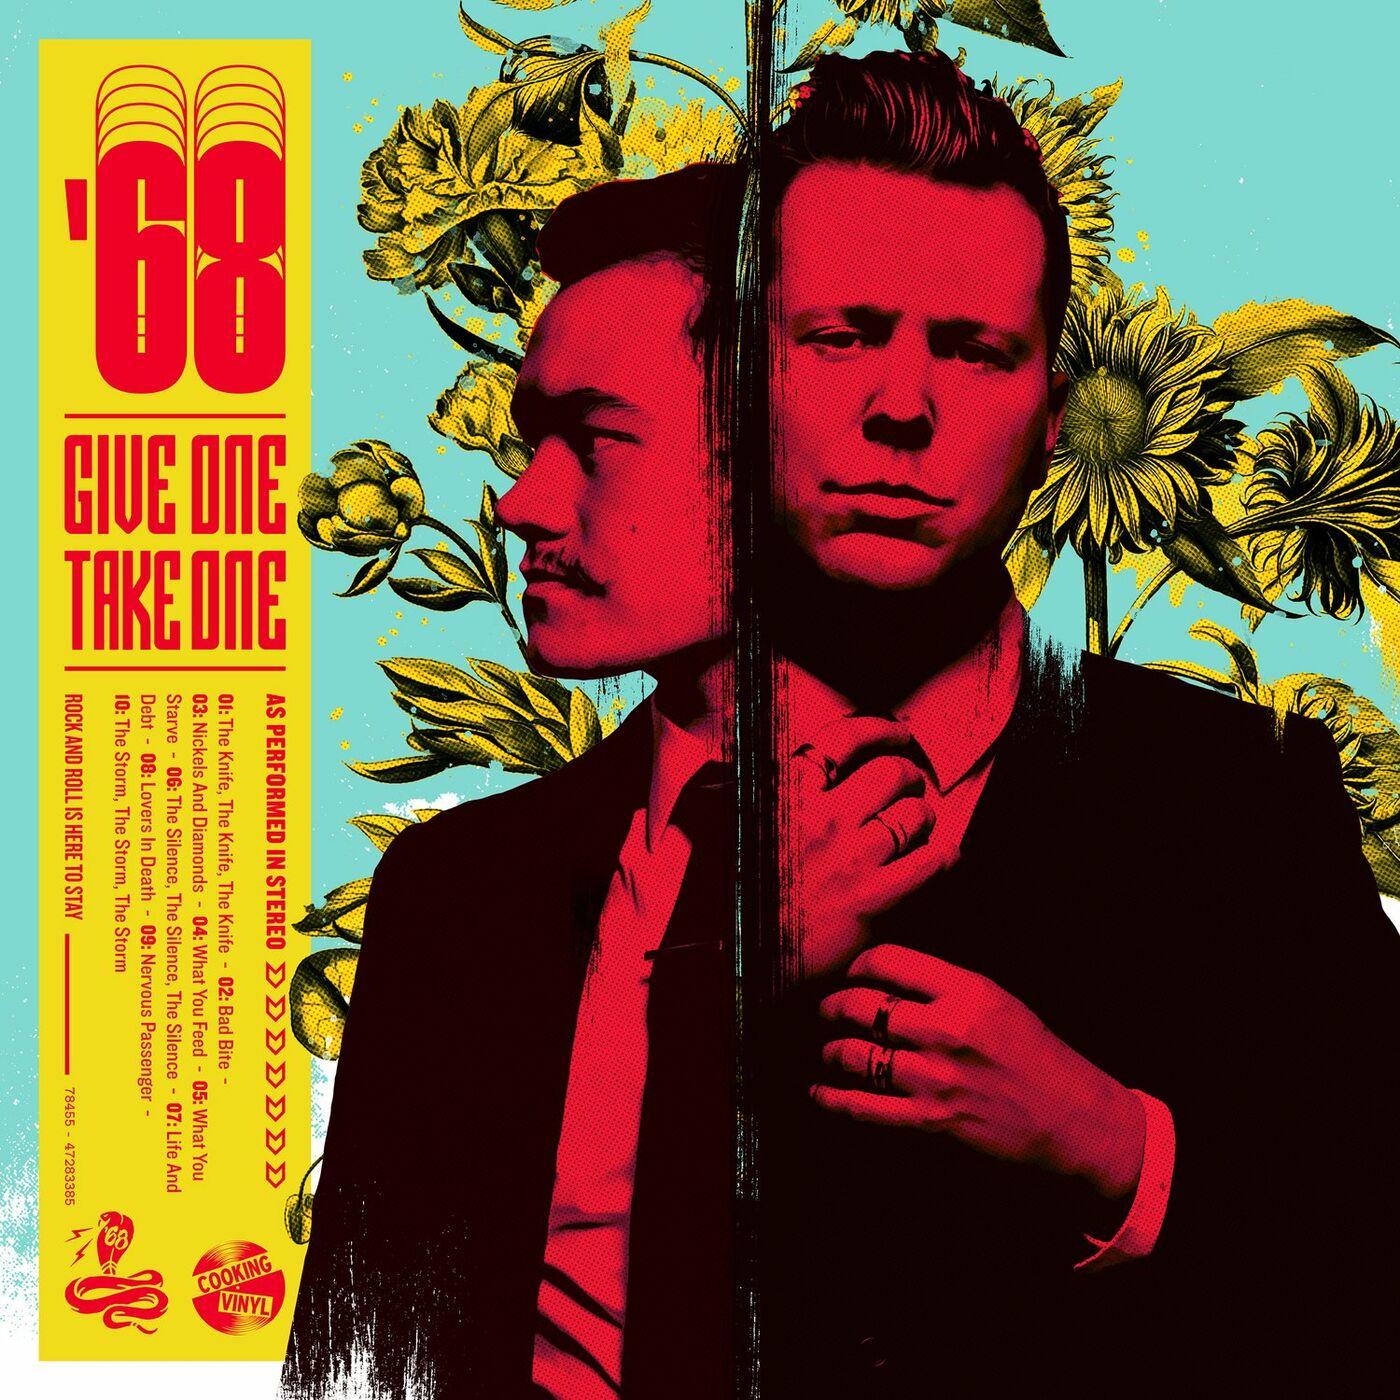 '68 - Give One Take One (2021)